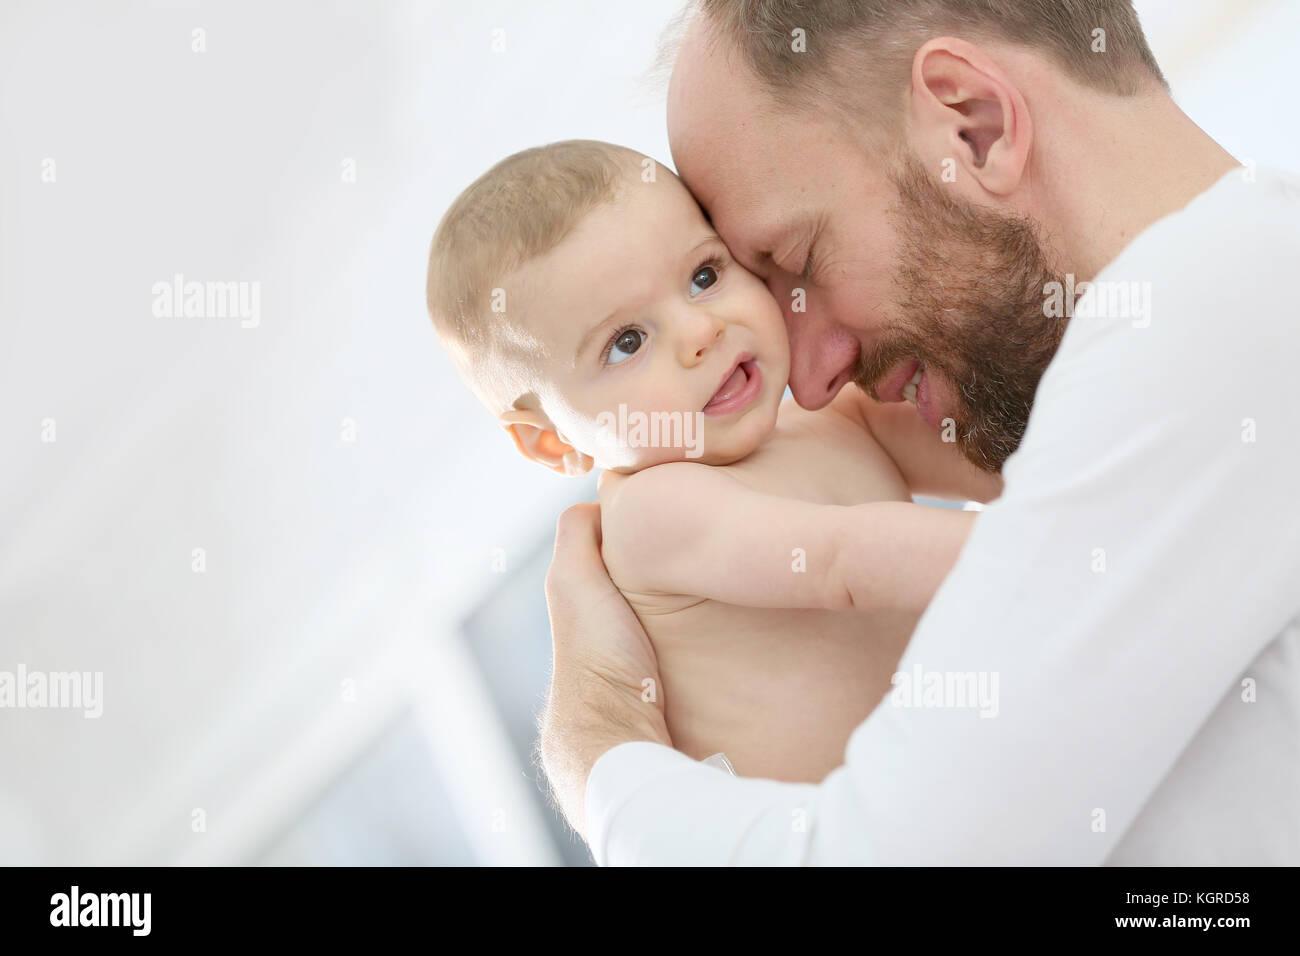 Portrait of daddy cuddling newborn son - Stock Image